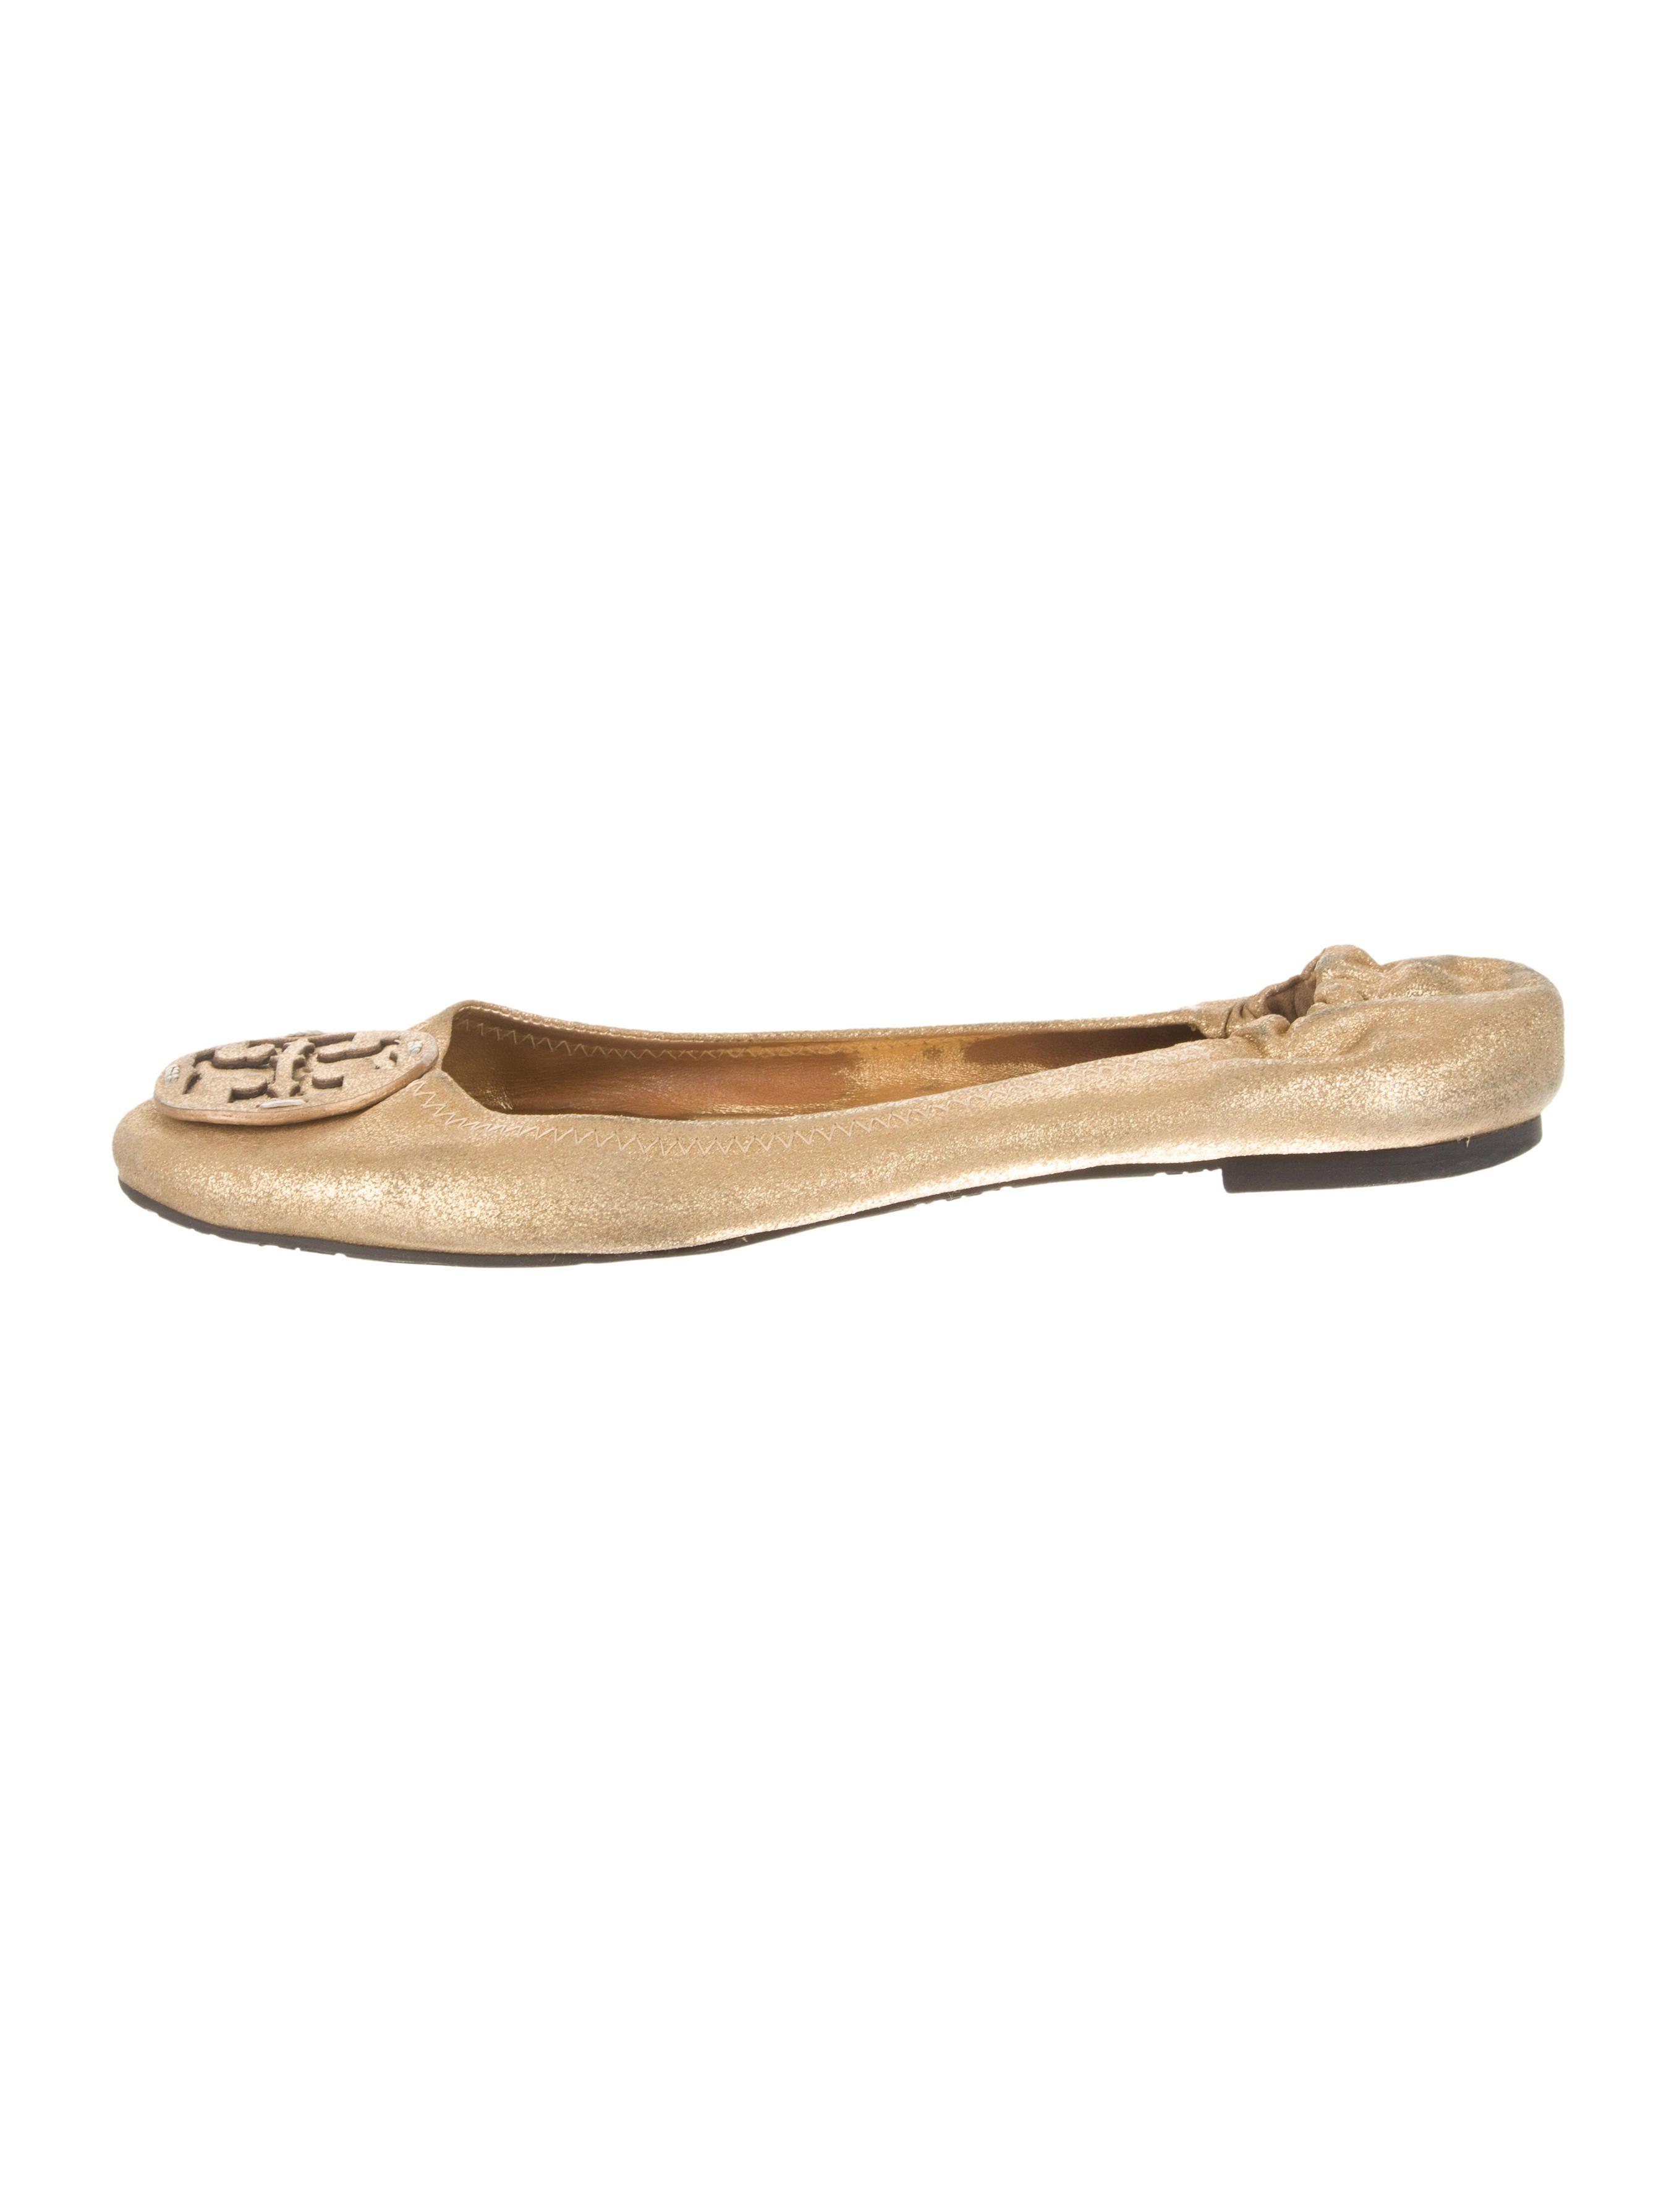 Tory Burch Reva Flats - Shoes - WTO48943 | The RealReal